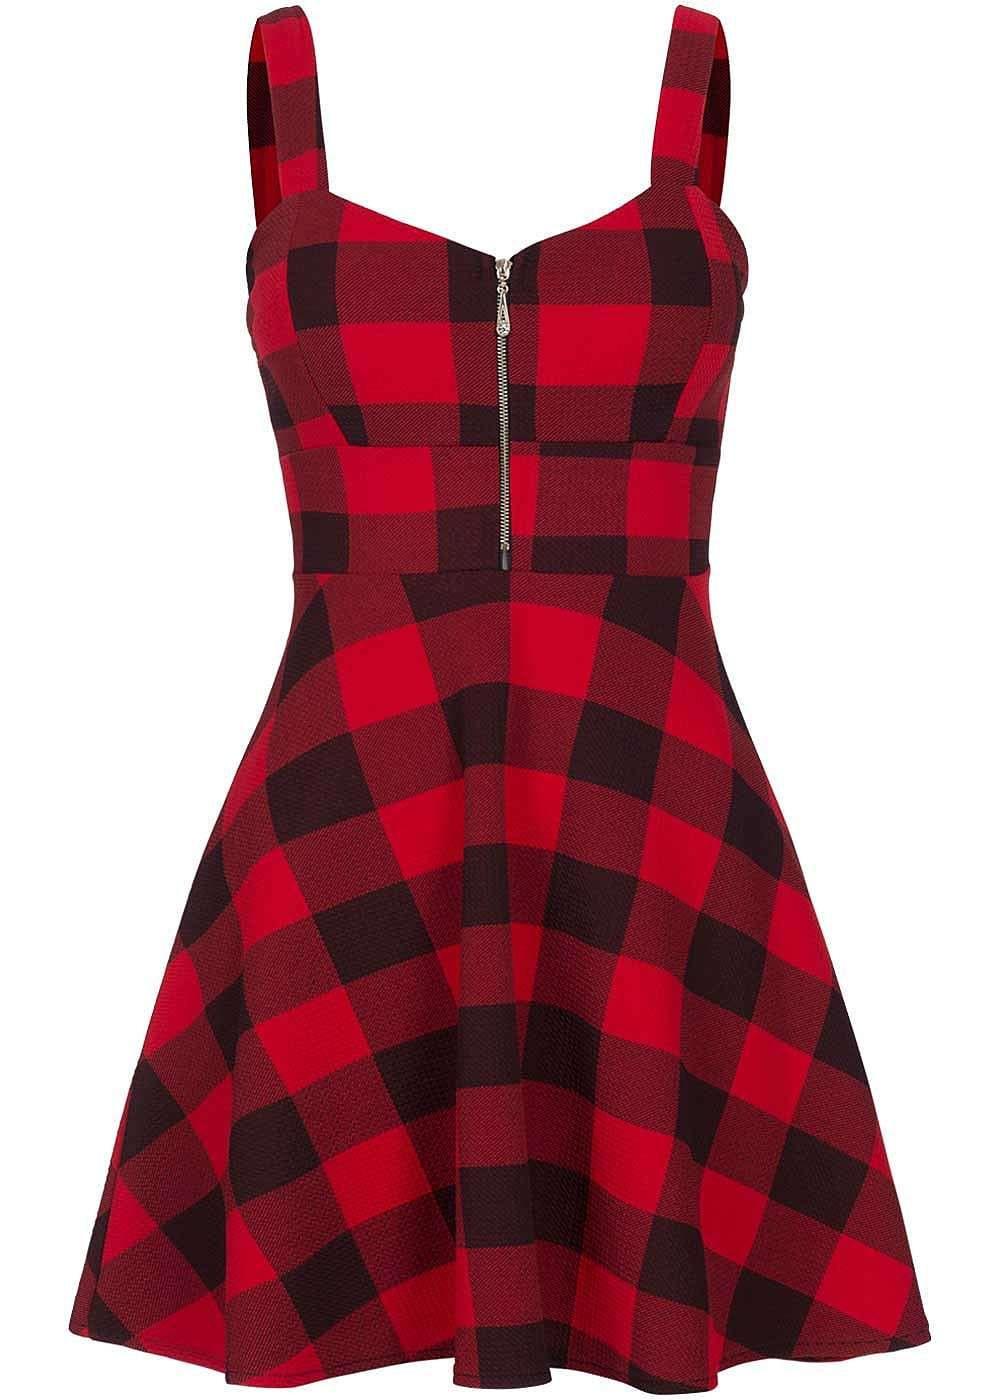 Styleboom Fashion Damen Mini Kleid Karo Muster Brustpads